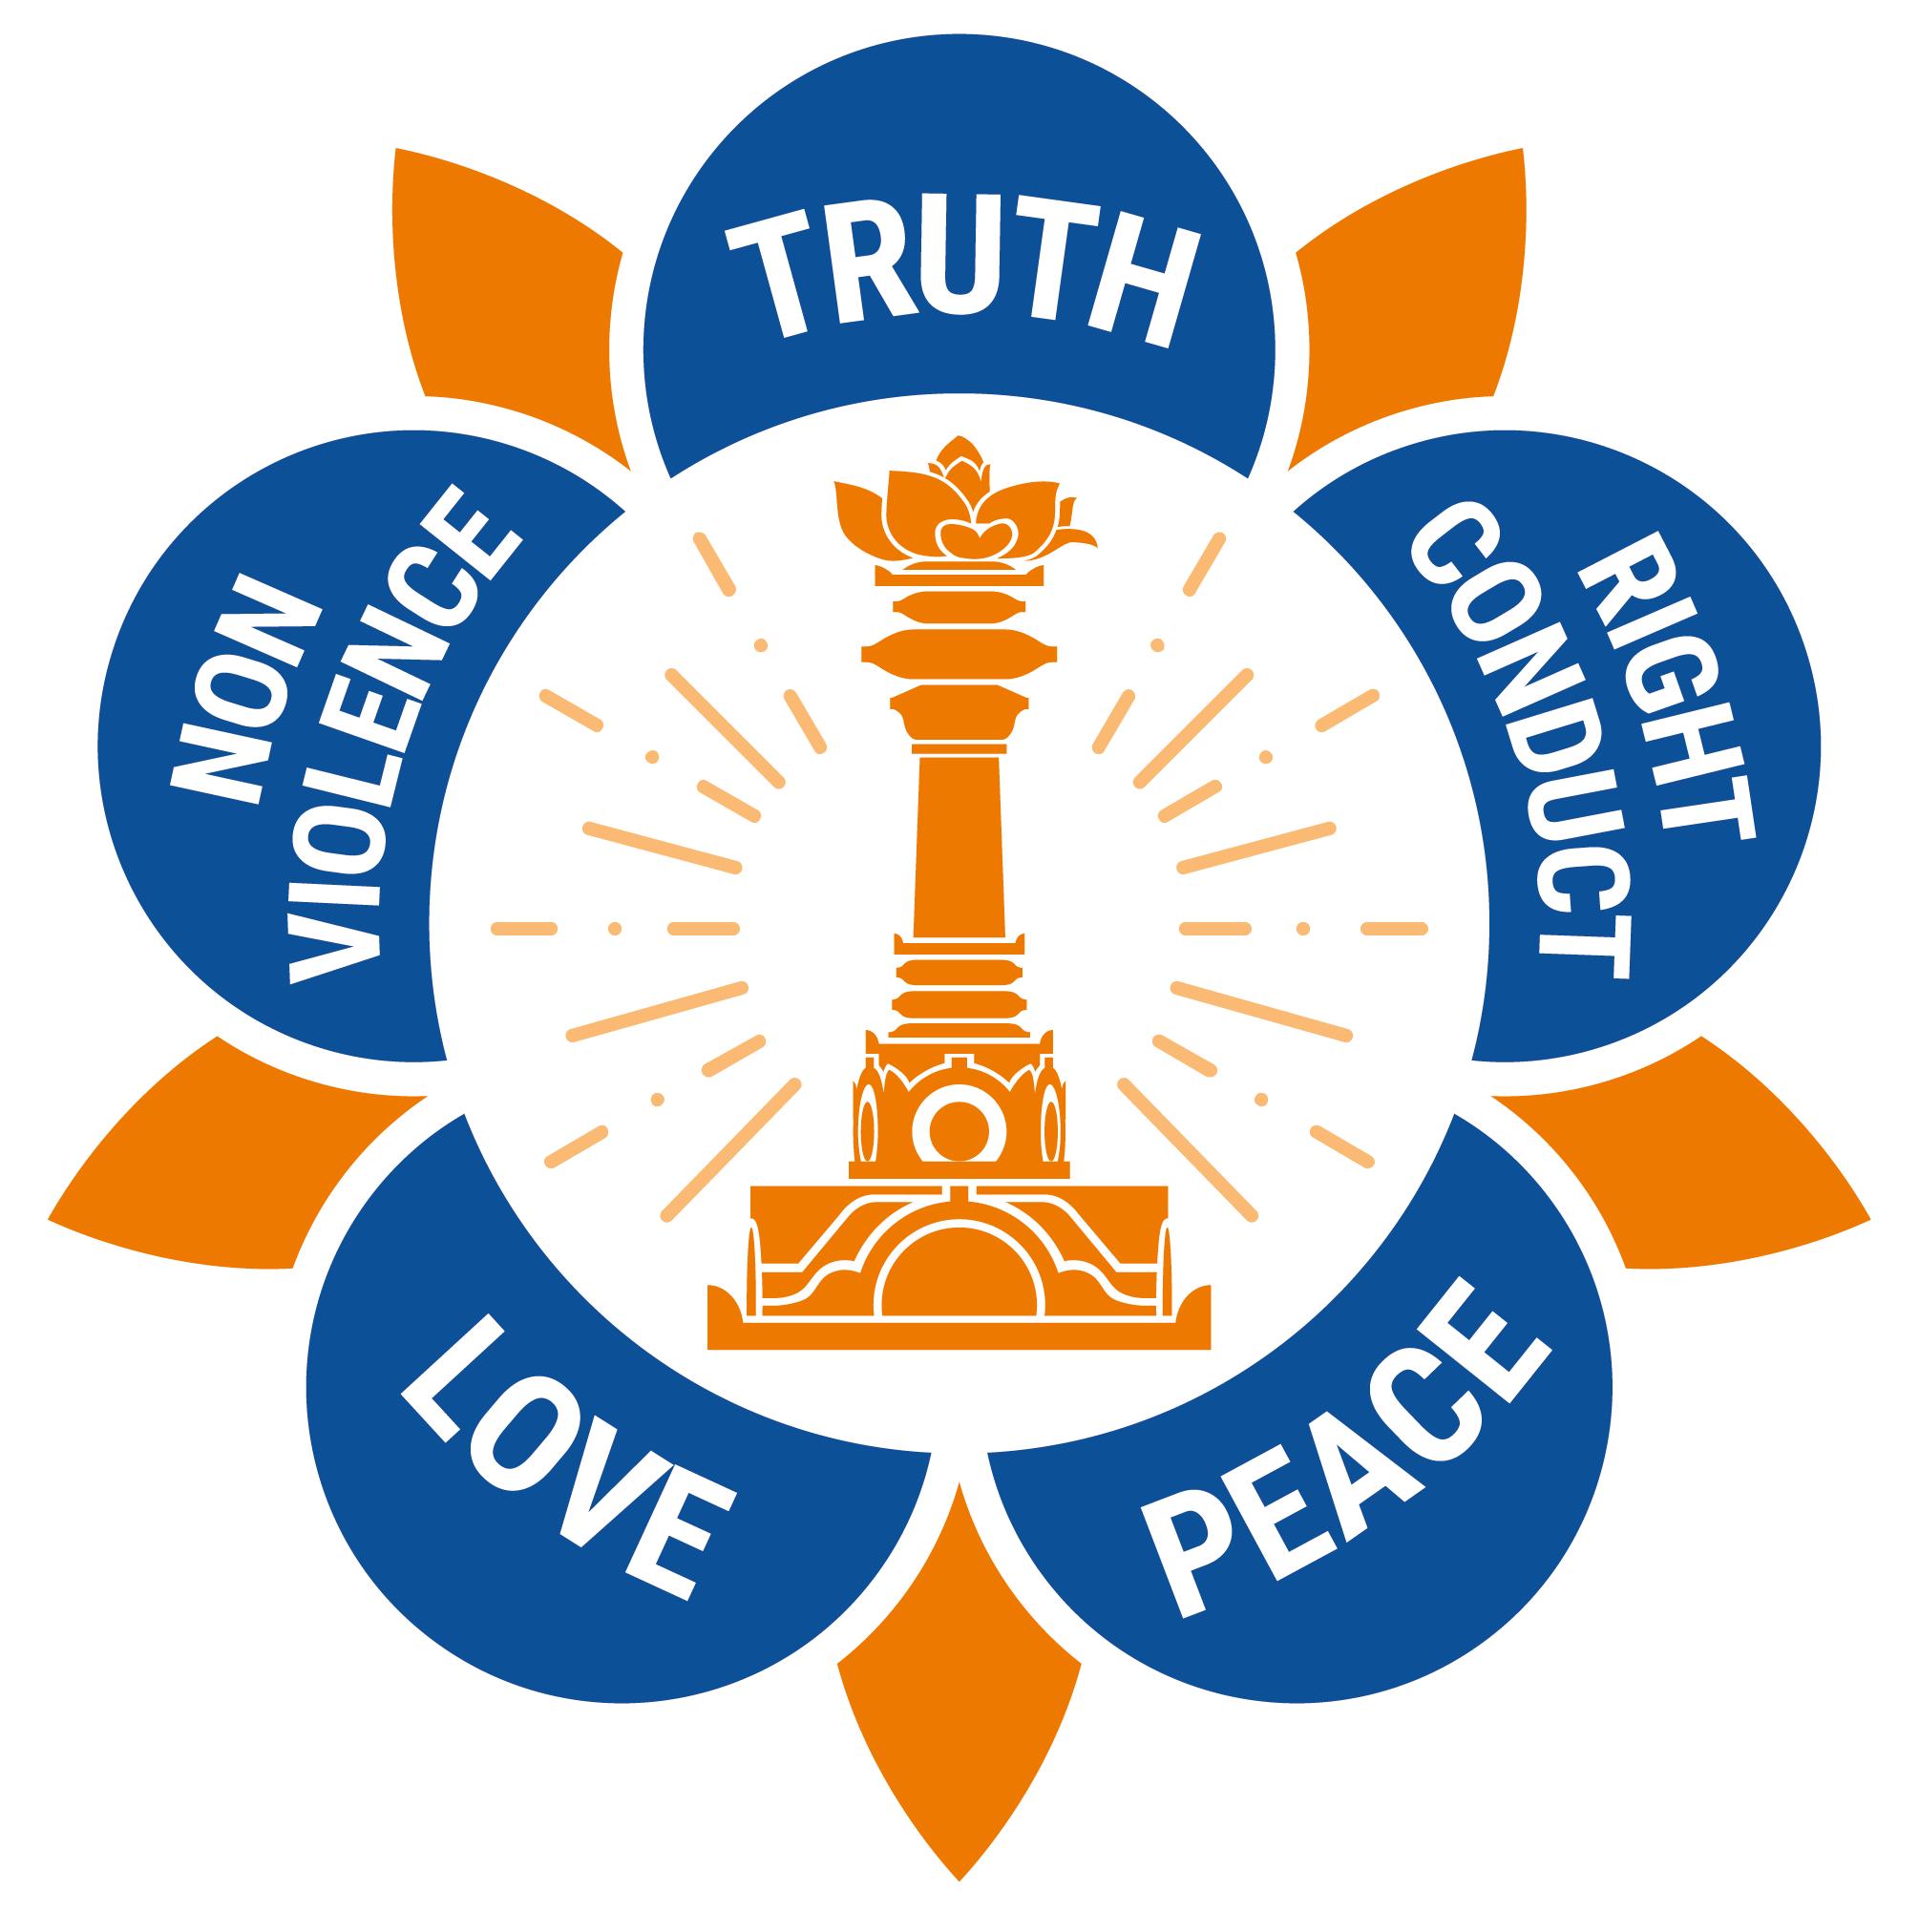 logo of the sathya sai international organisation sathya